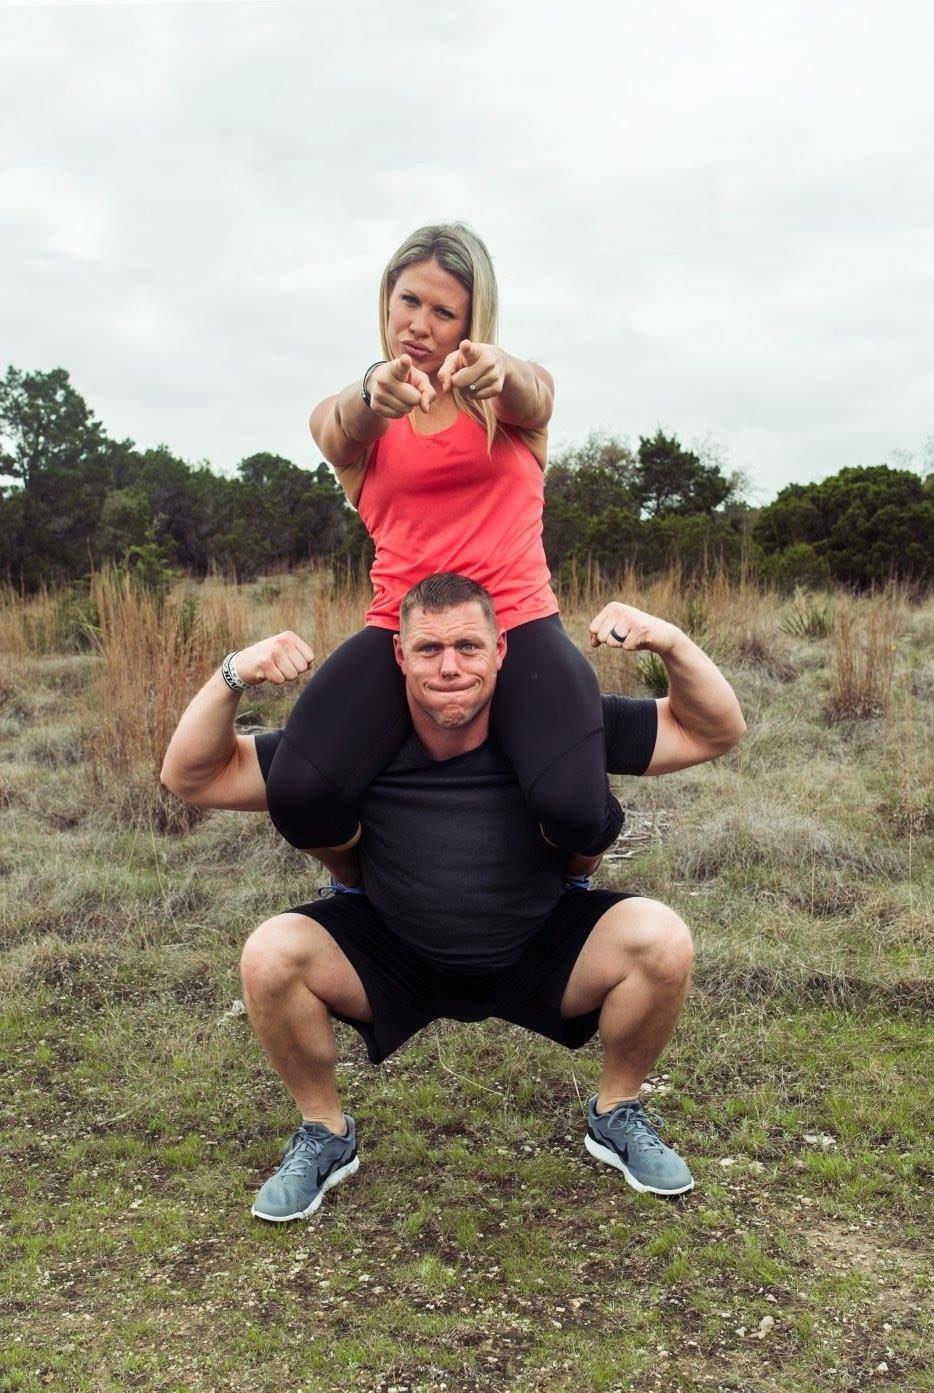 Personal Trainer Austin, Texas - Robert Mamula